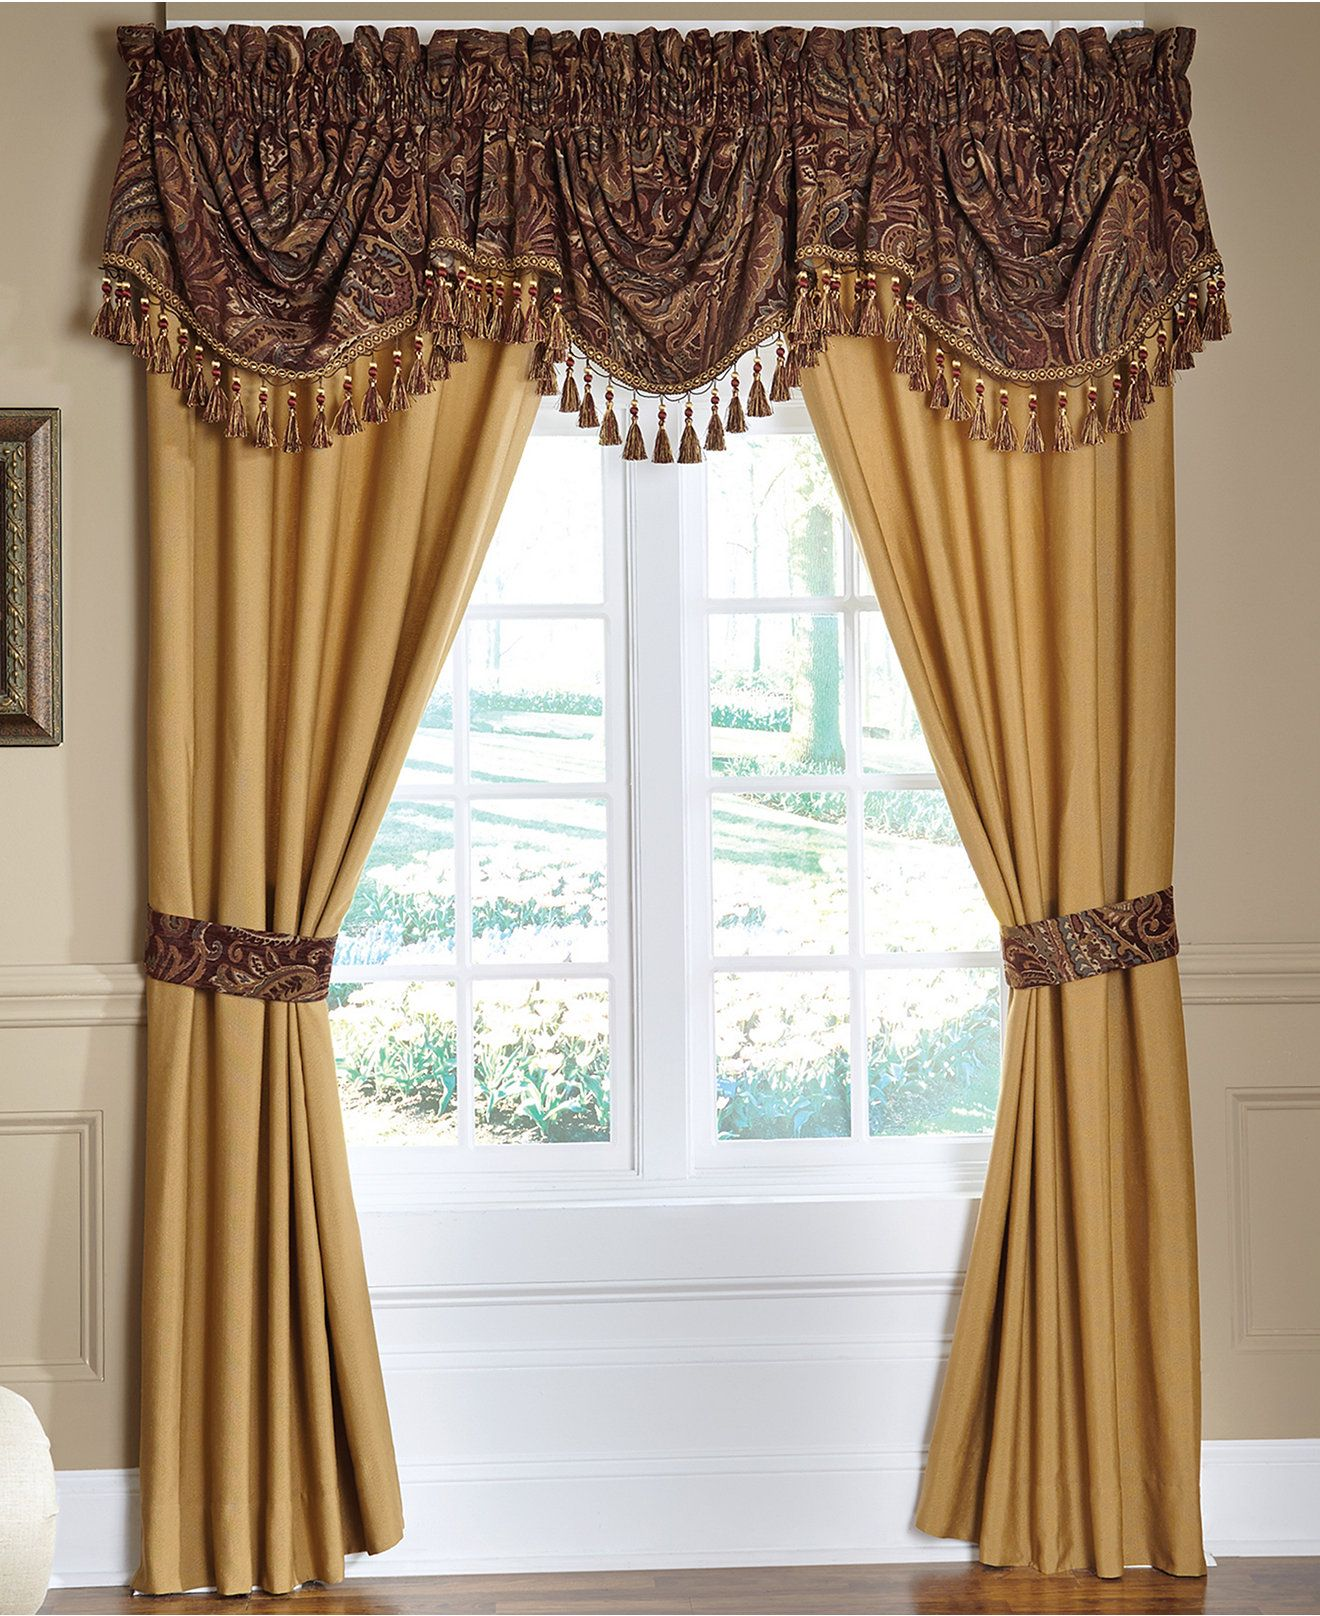 Croscill Regalia 44 x 28 Swag Window Valance - Bedding Collections ...